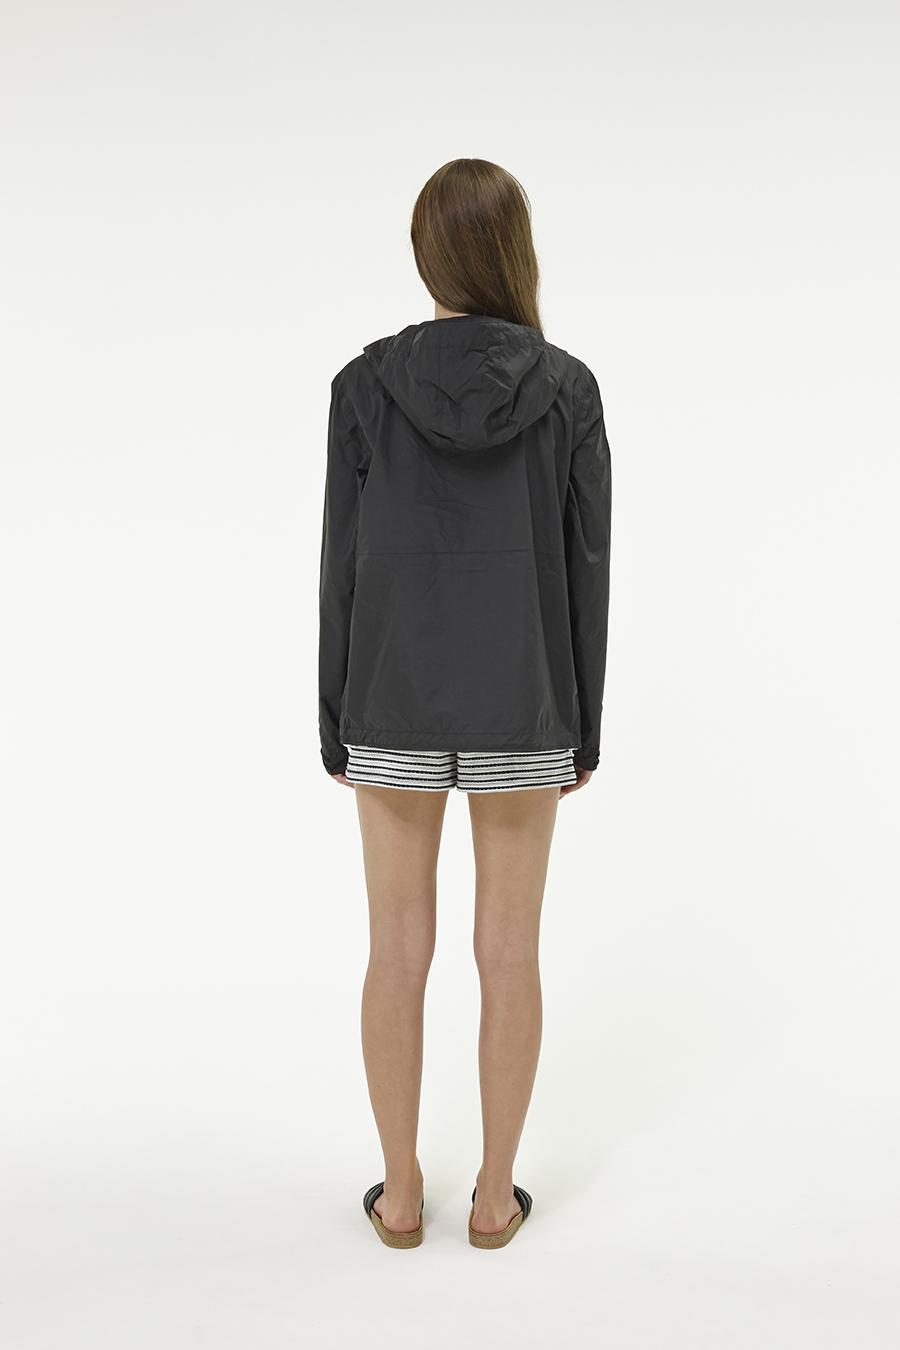 Huffer_Q3-16_W-Alpine-Jacket_Black-03